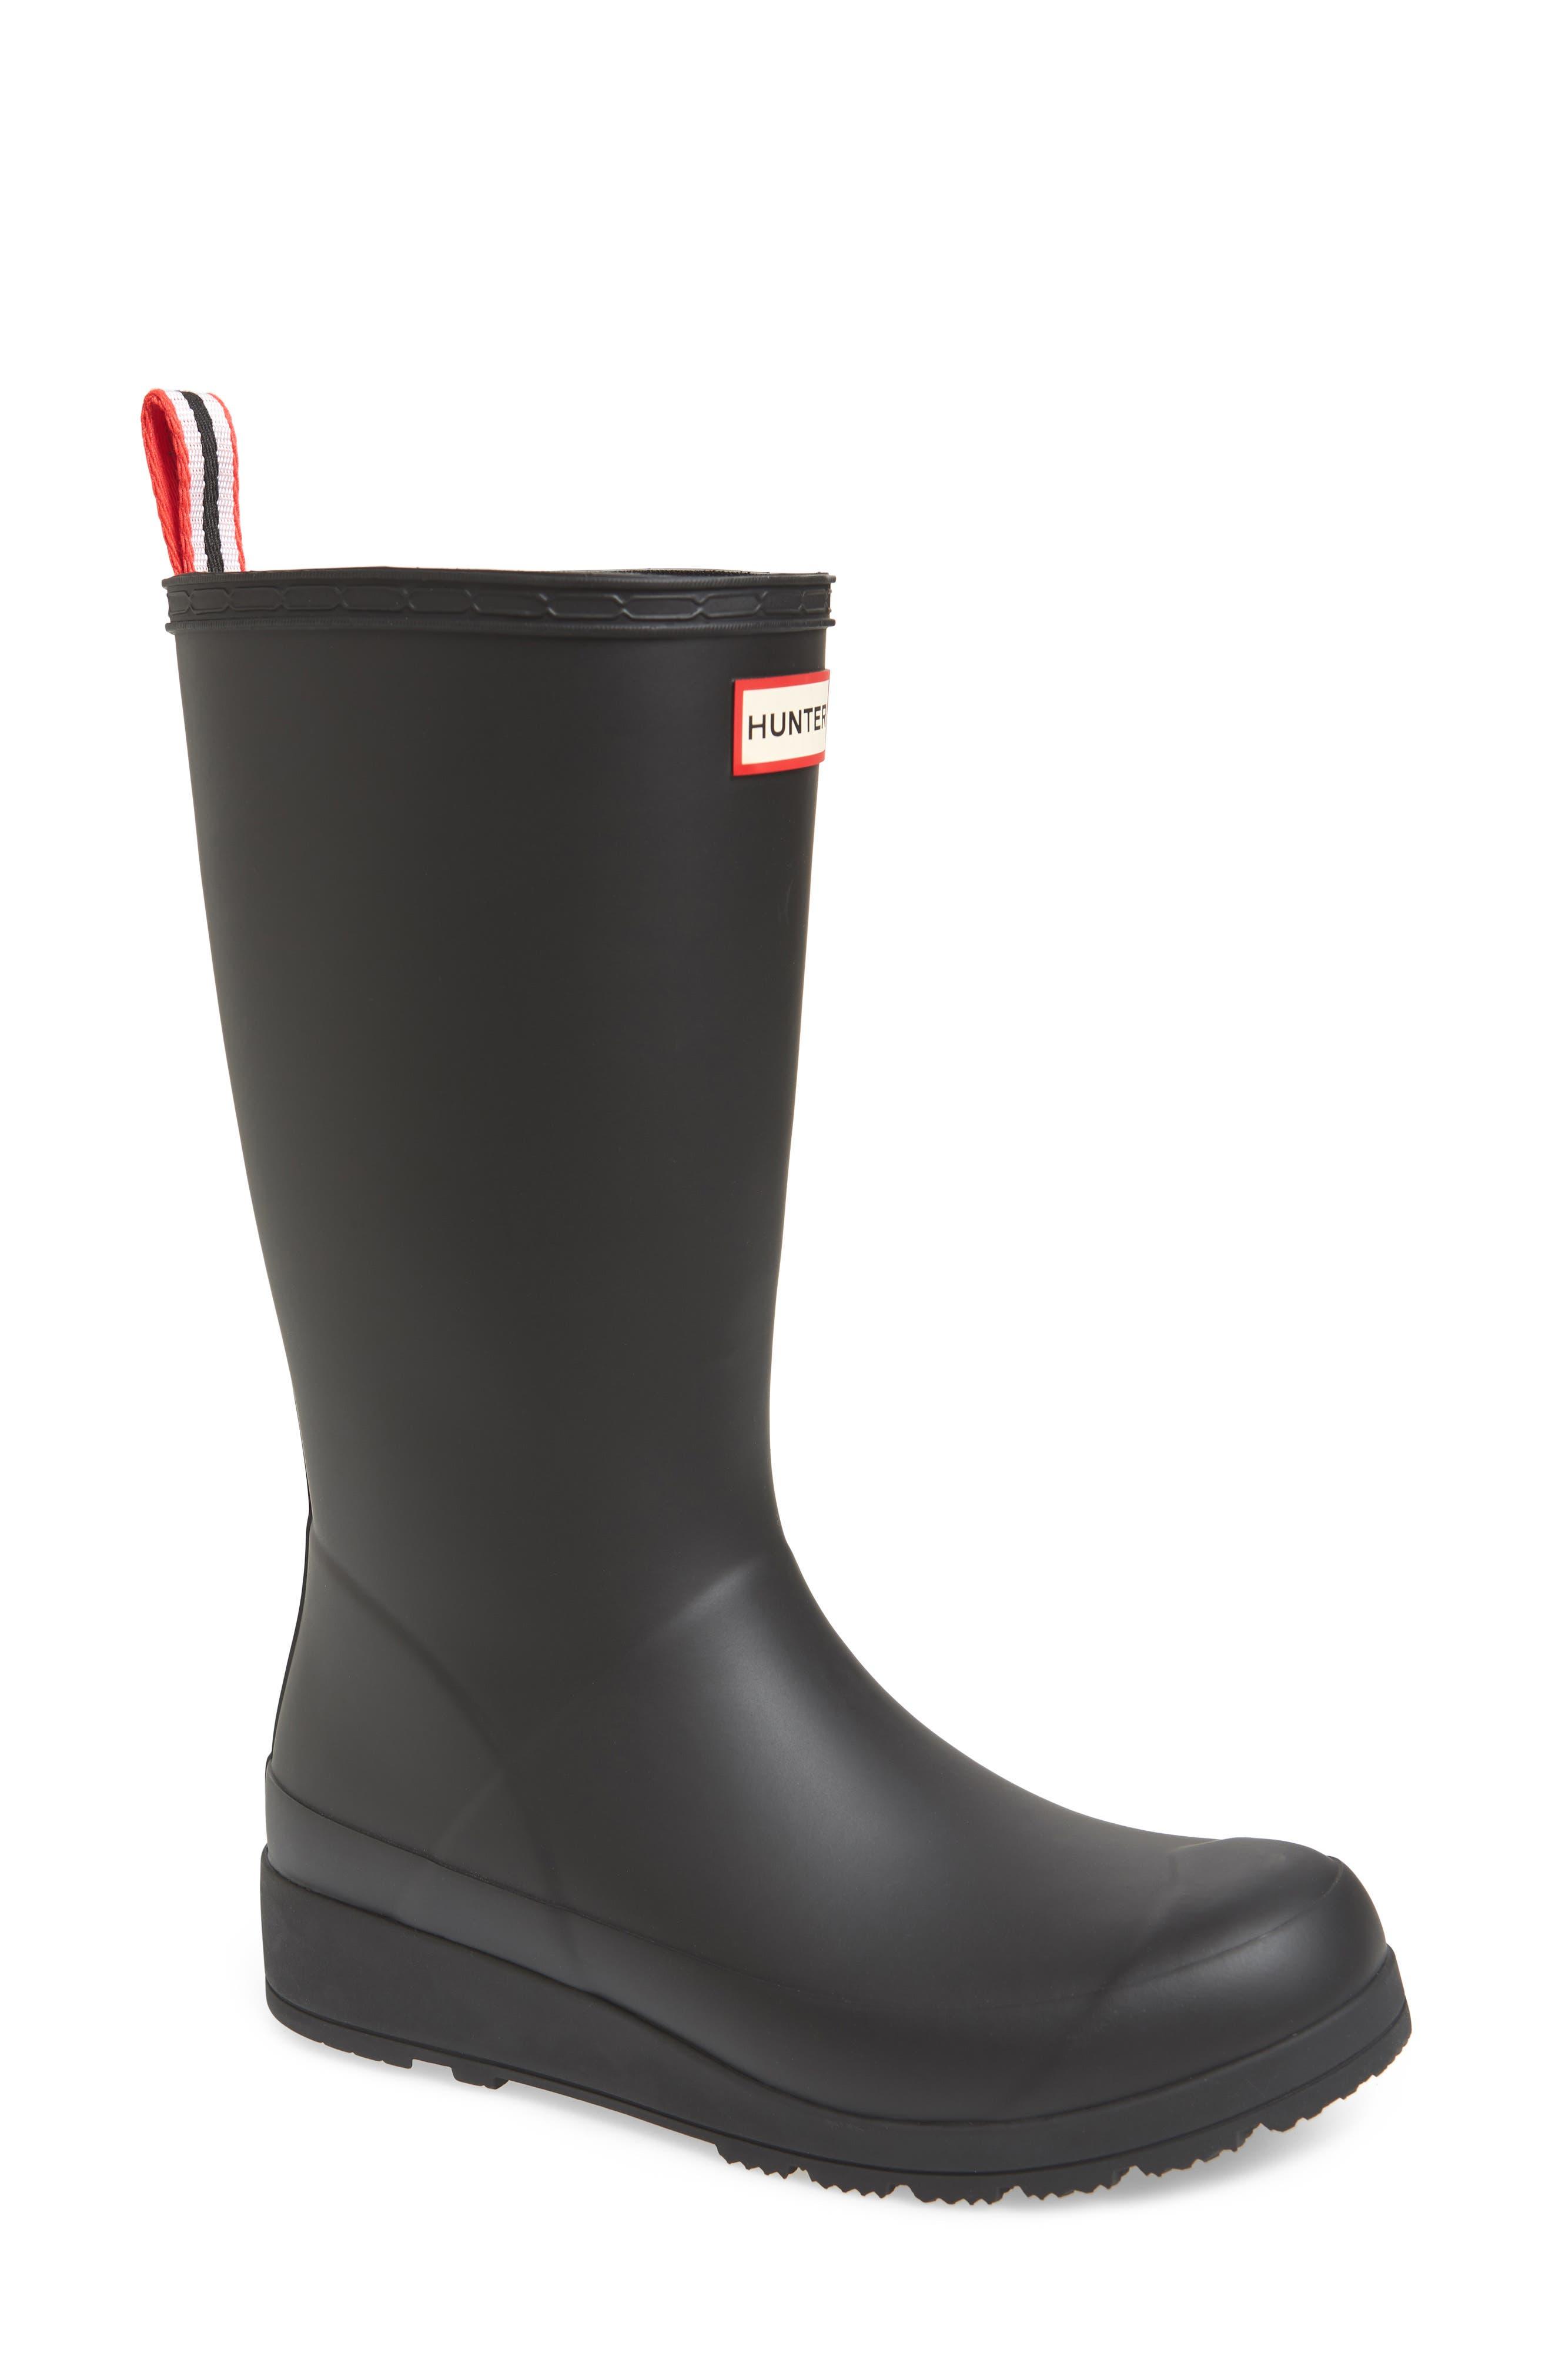 Hunter Original Play Tall Waterproof Rain Boot, Black